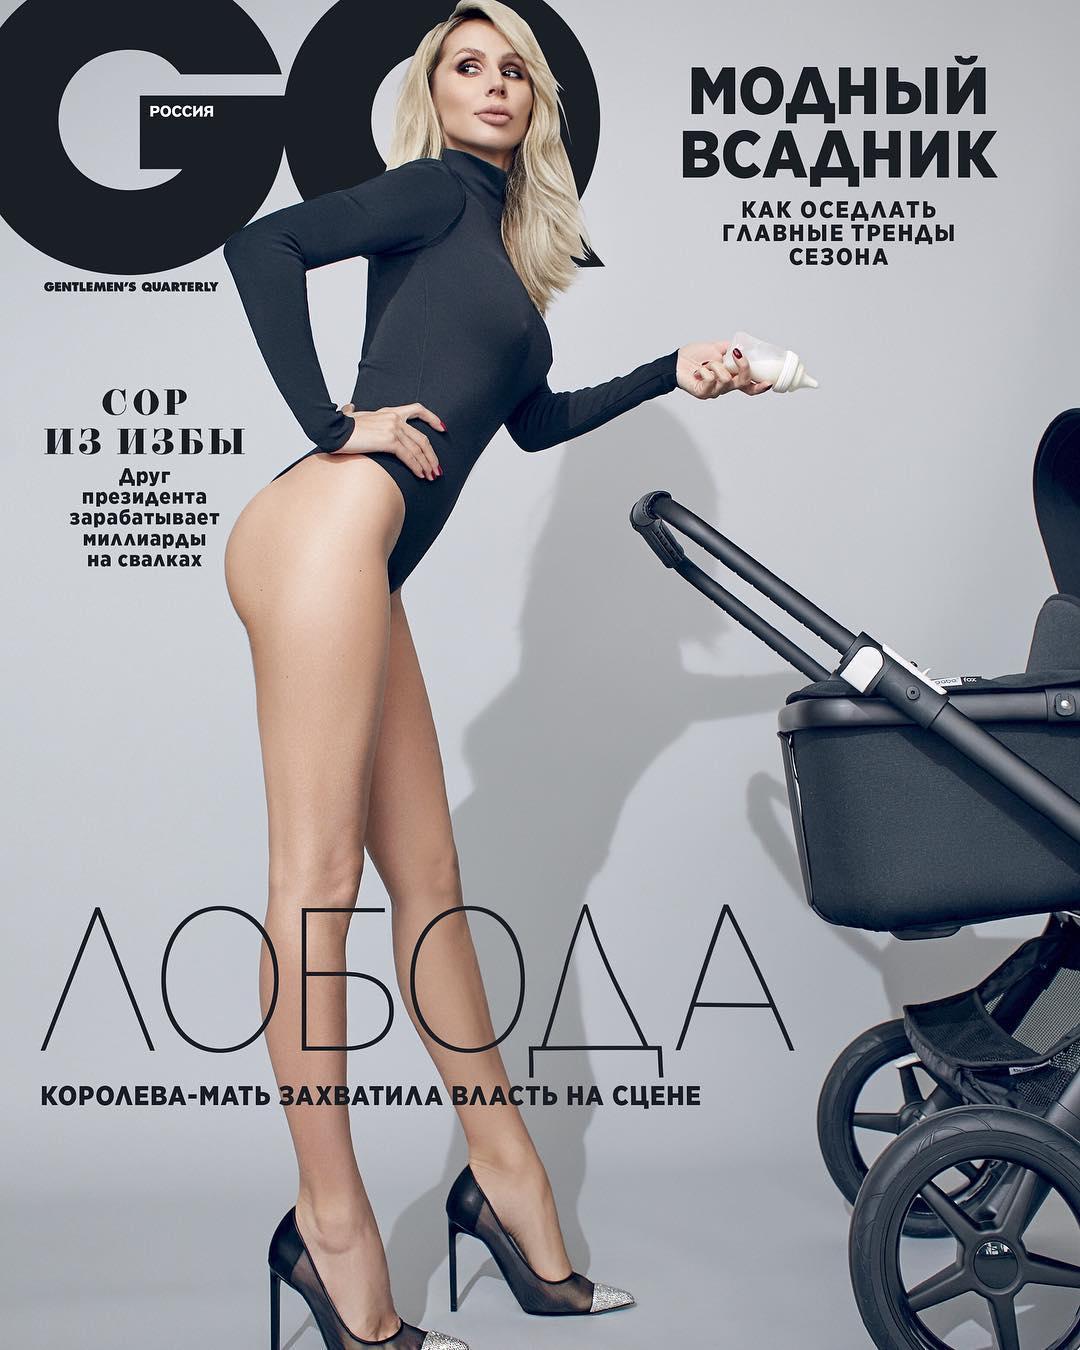 Светлана Лобода — откровенно о материнстве и втором ребенке